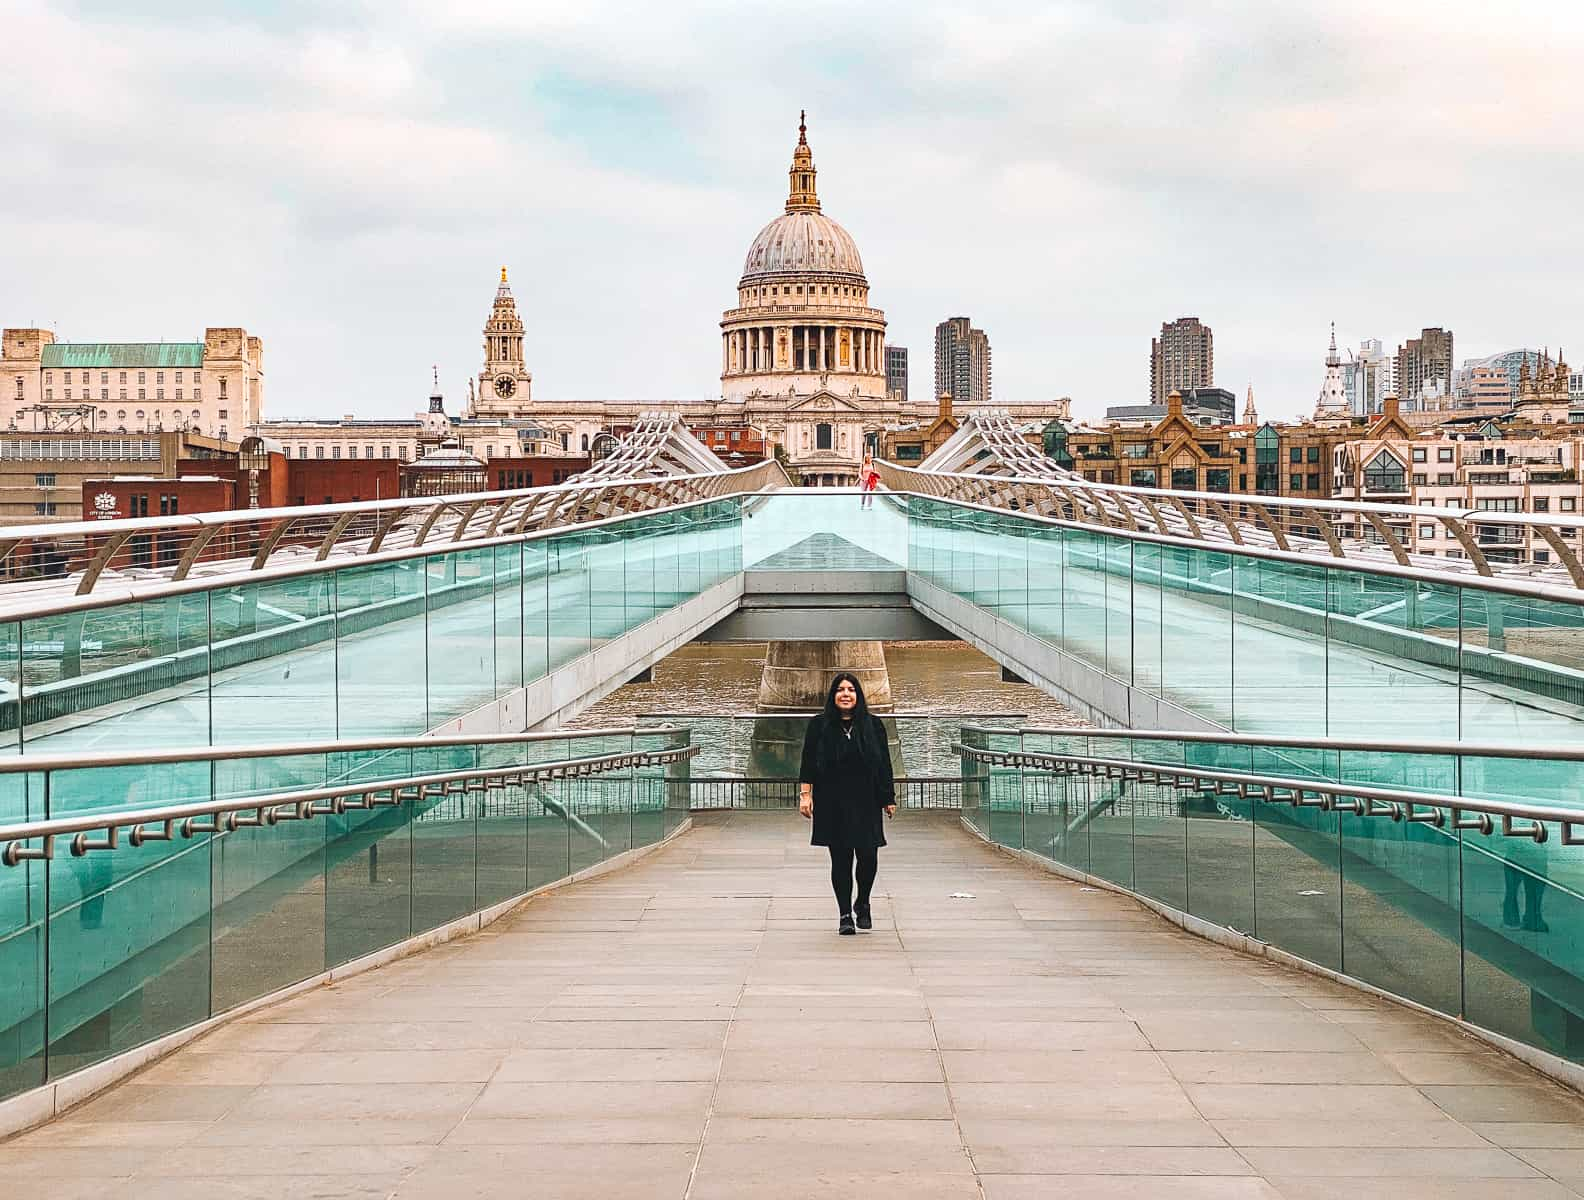 Millennium Bridge Harry Potter filming location